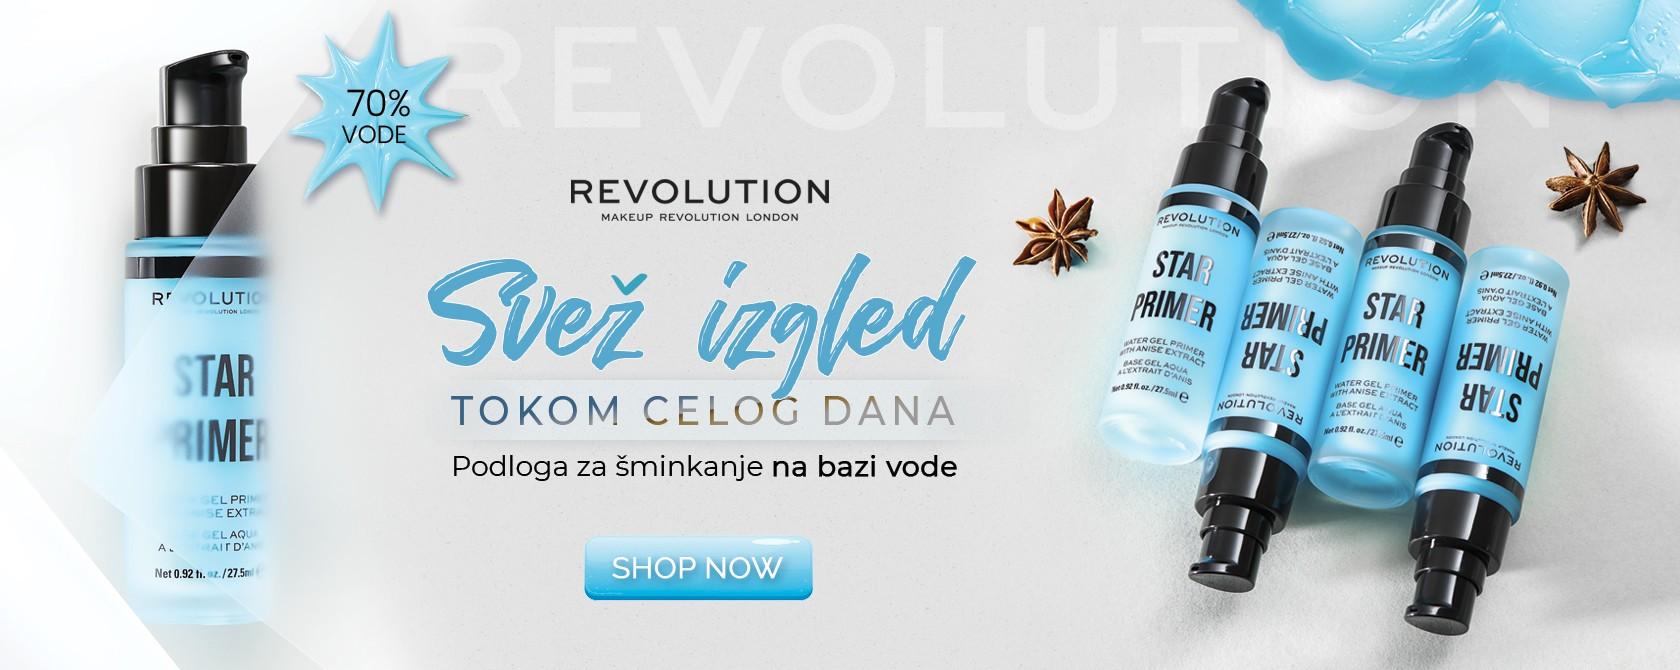 Revolution star primer